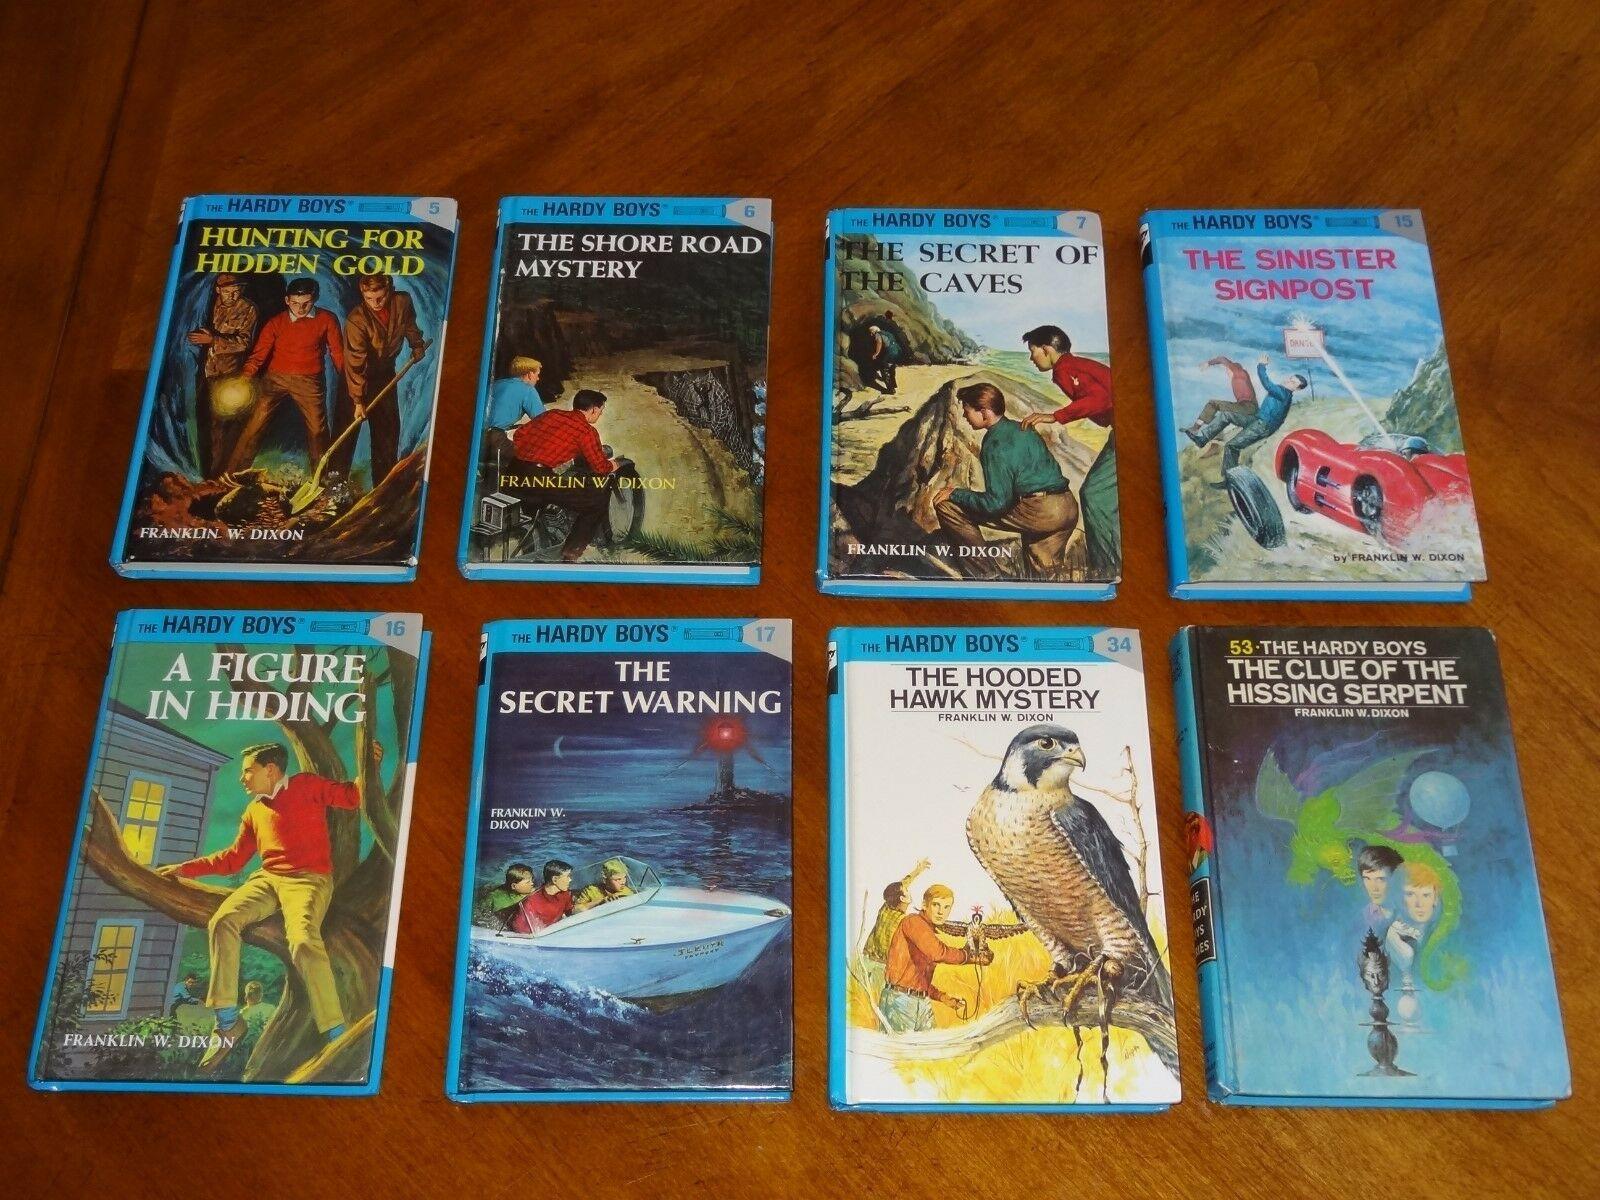 The Hardy Boys Franklin W. Dixon Book Lot of 8 Series Vol 5 6 7 15 16 17 34 53